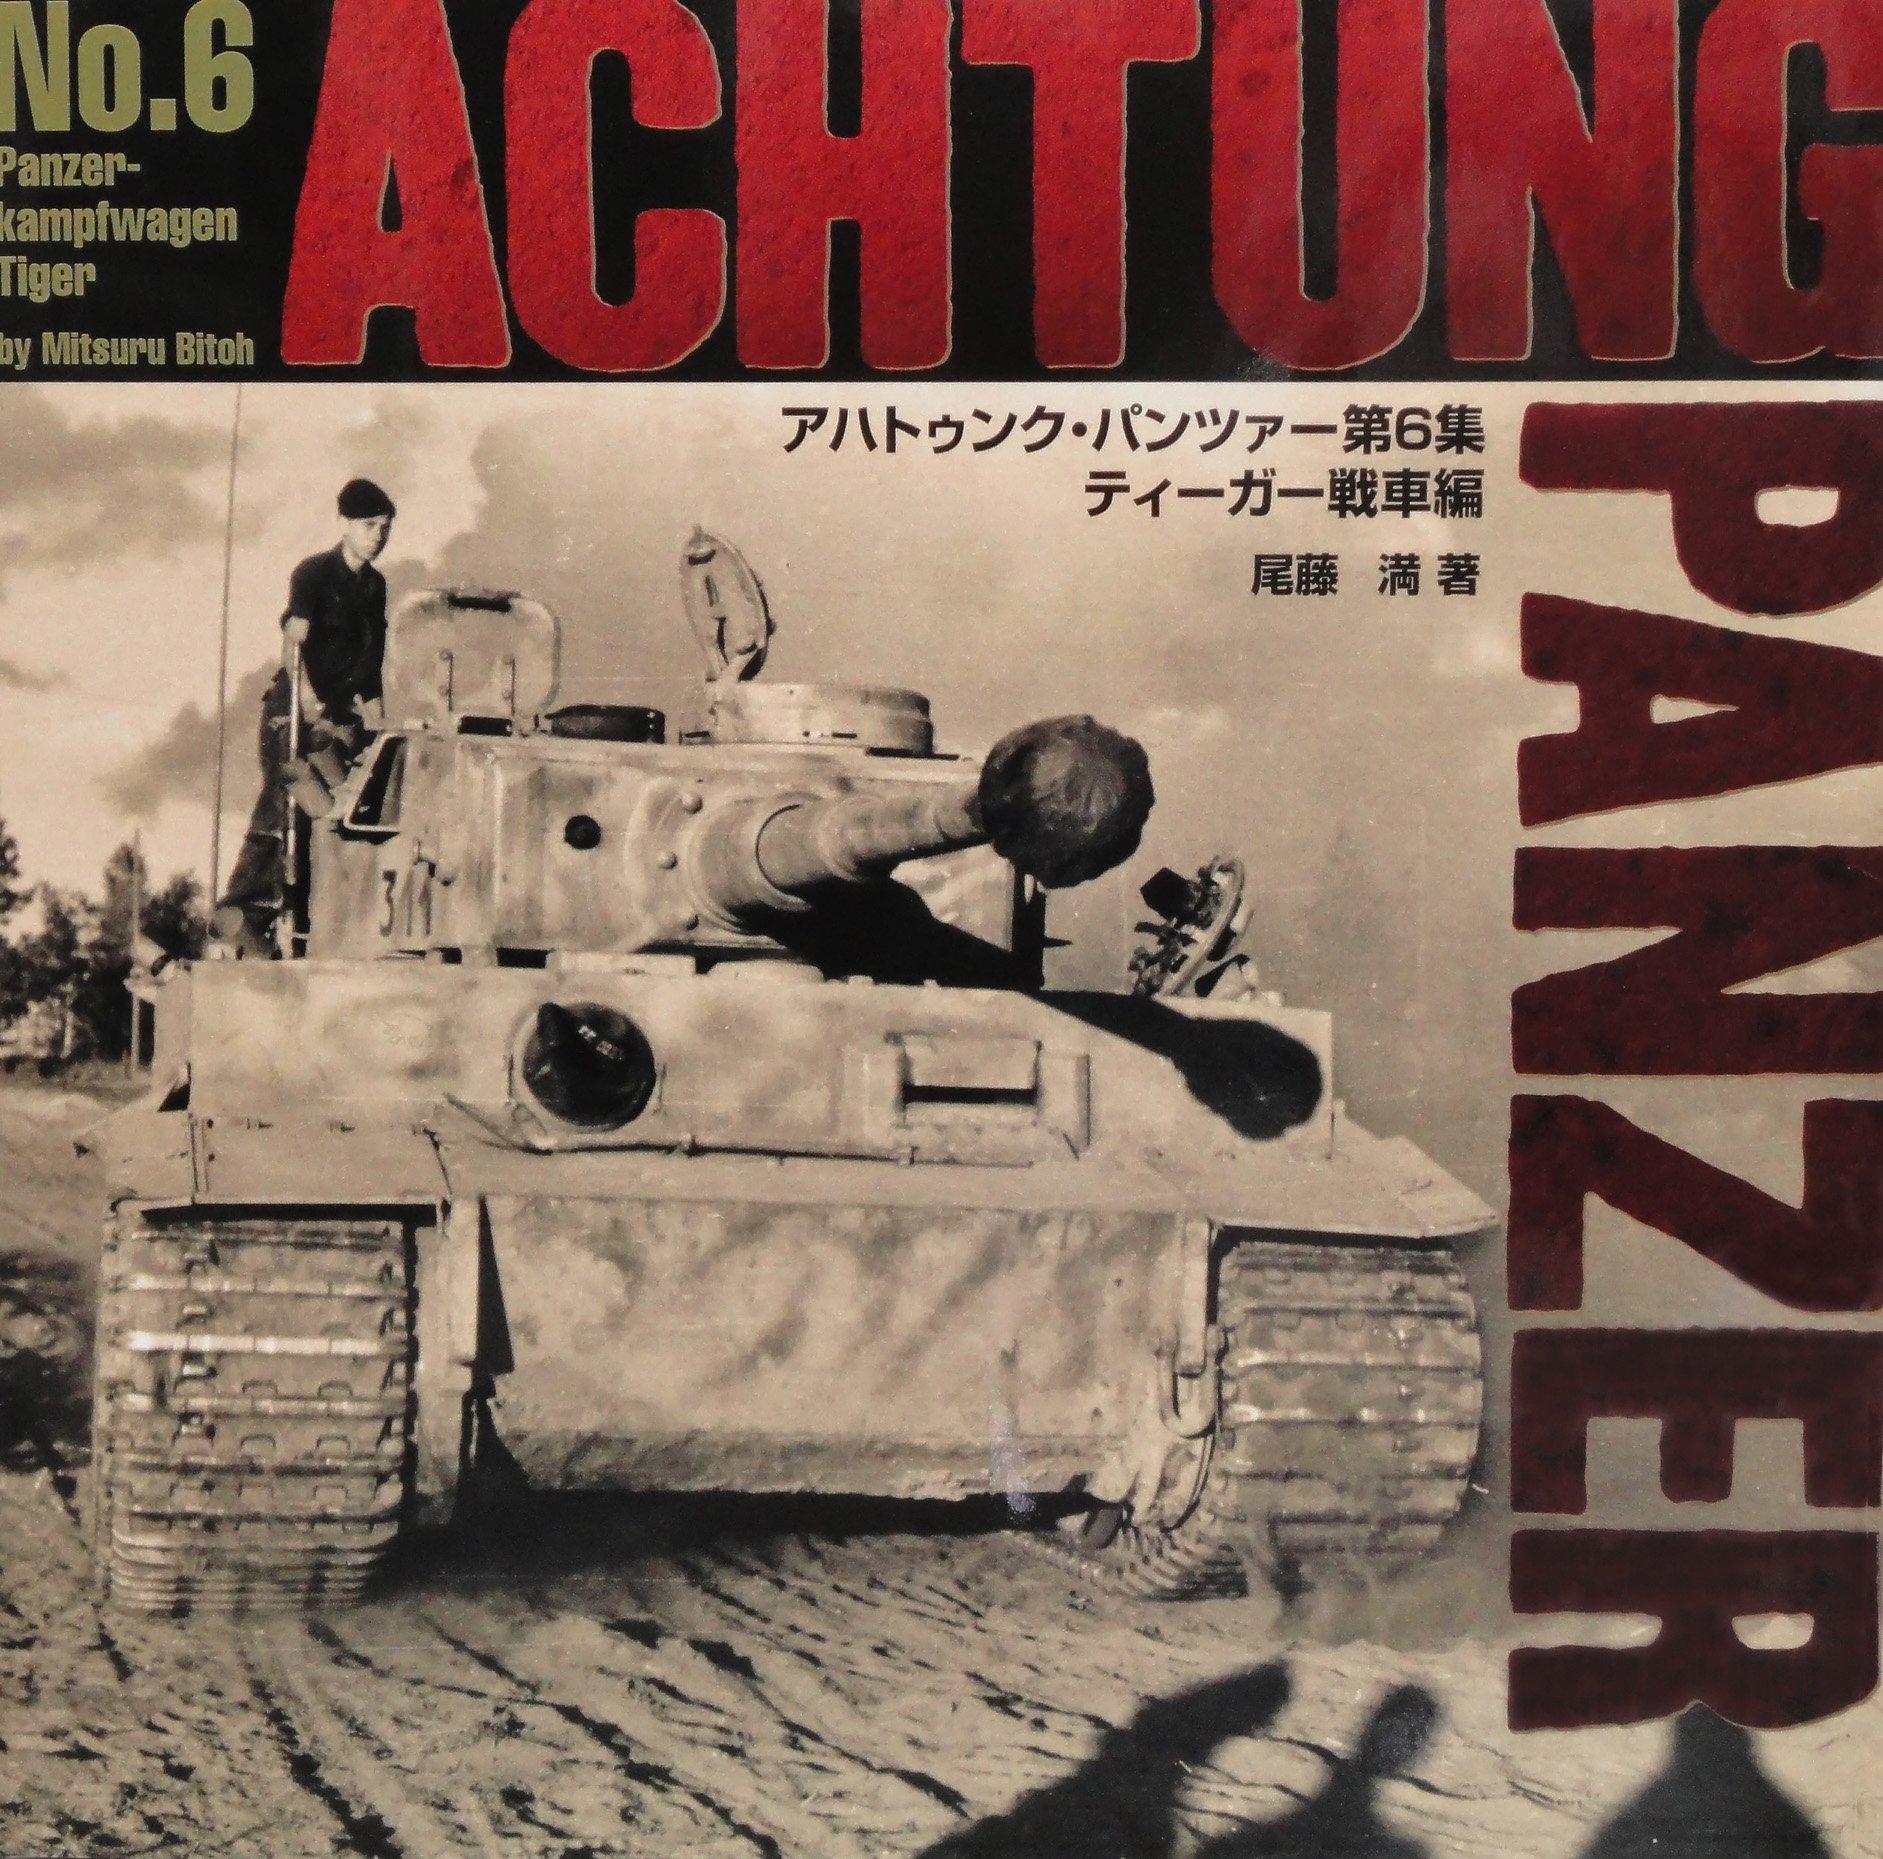 Achtung panzer no. 6: panzerkampfwagen tiger: mitsuro bitoh.